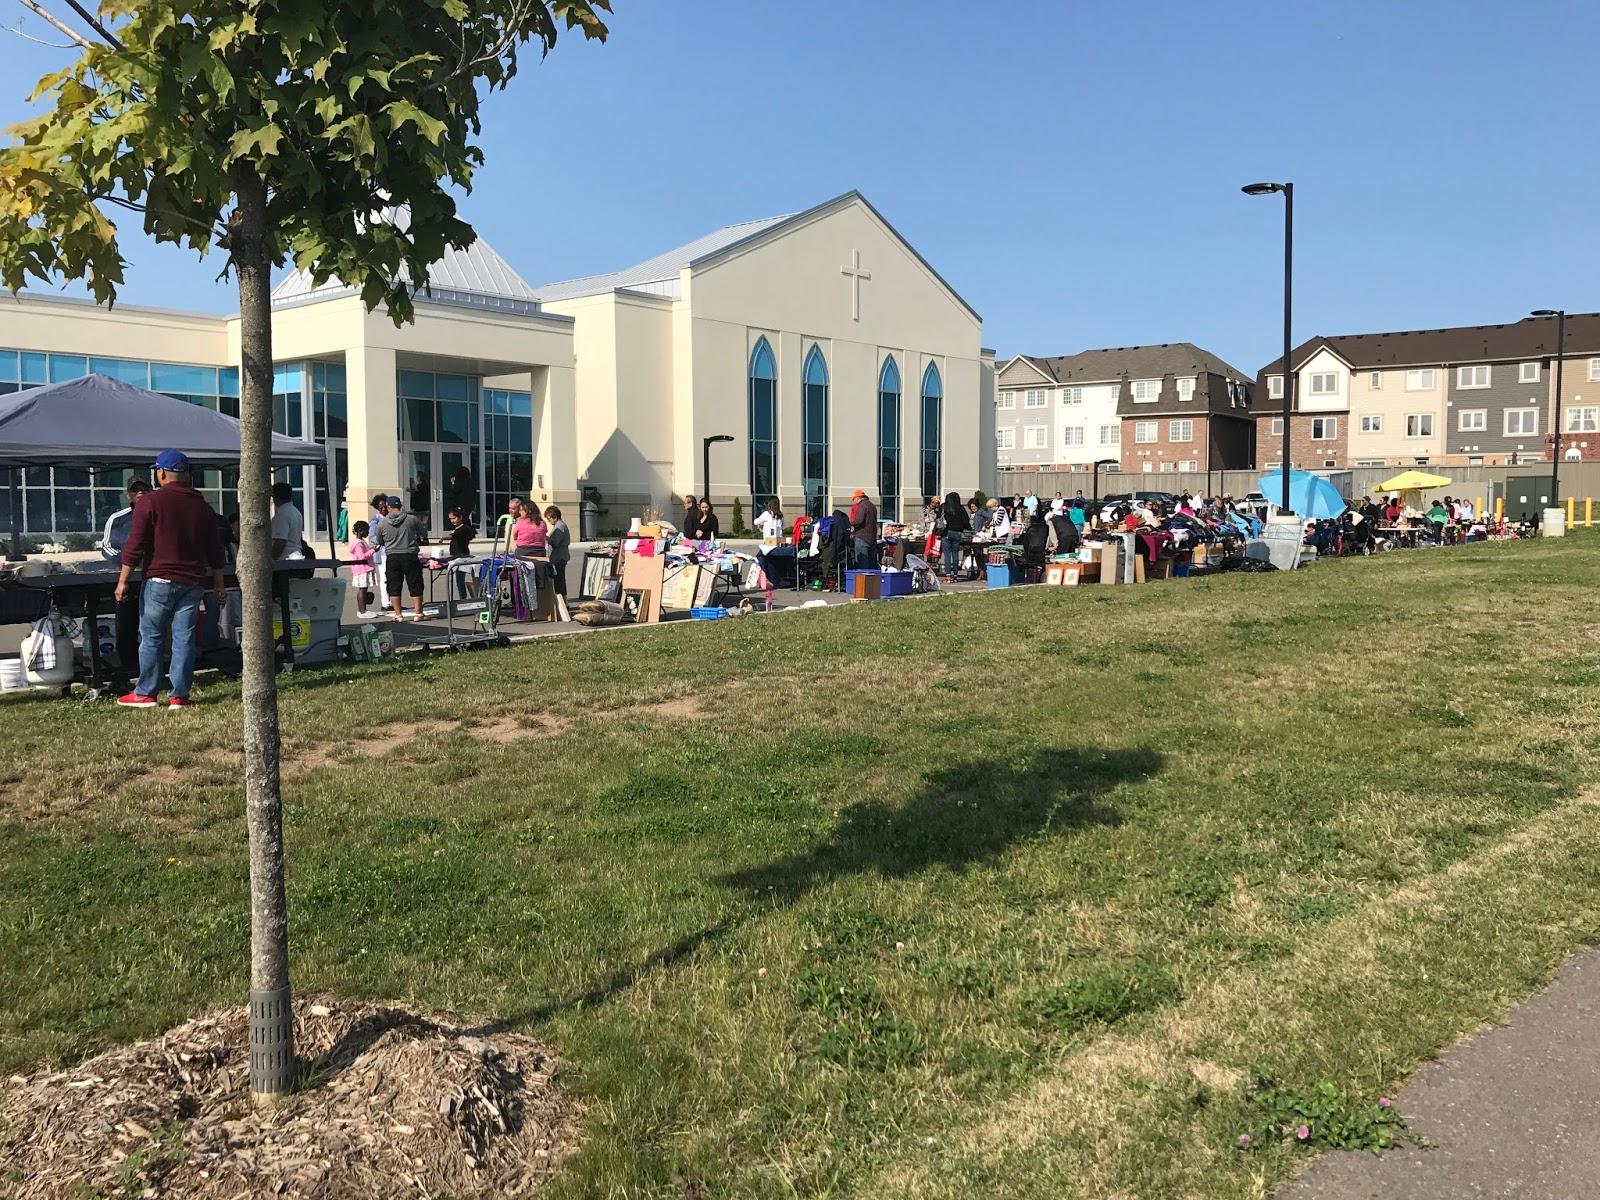 GARAGE SALE SERIES 2017 #7- CHURCH GARAGE SALE | FEBETH ( Diary of a